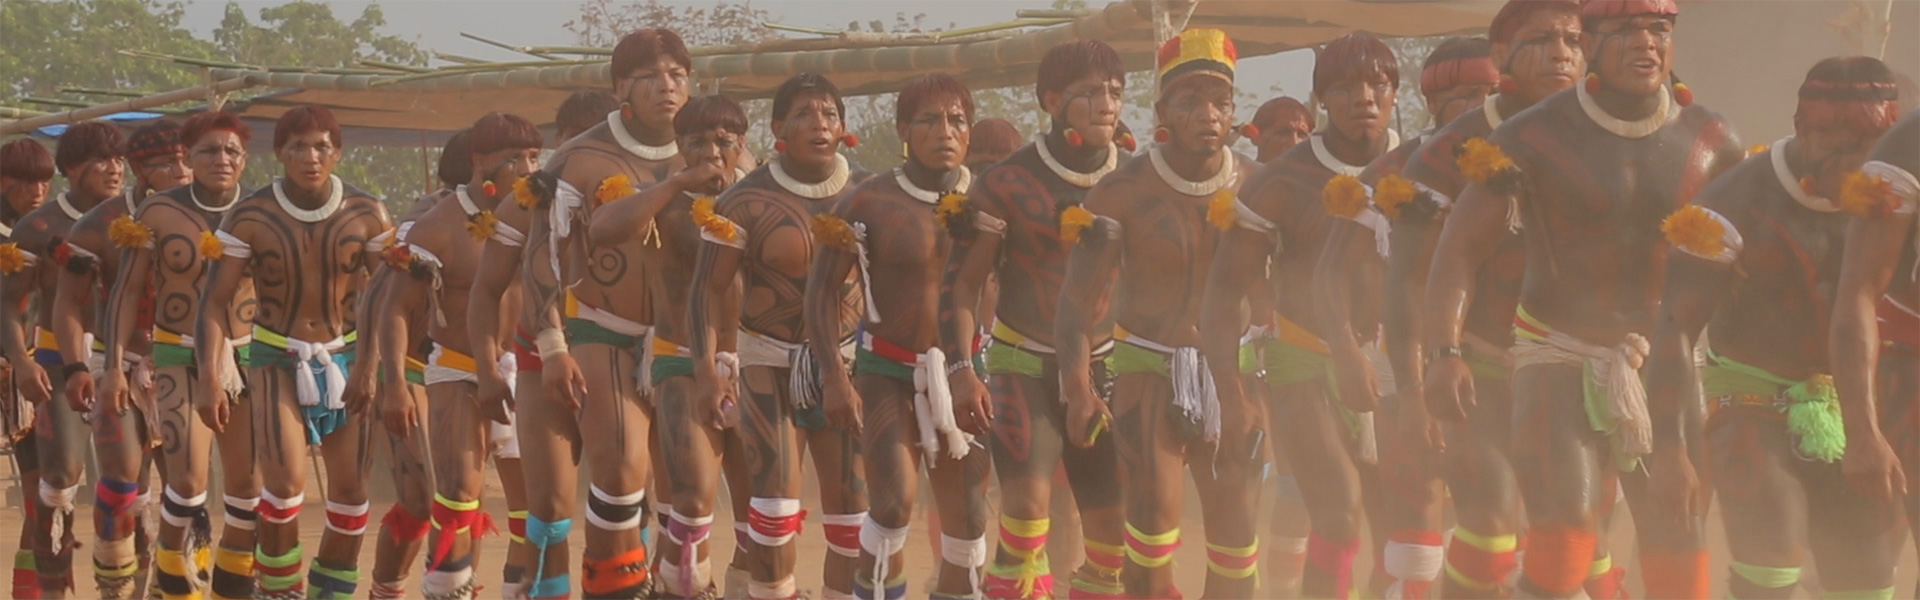 Os povos indígenas no Brasil